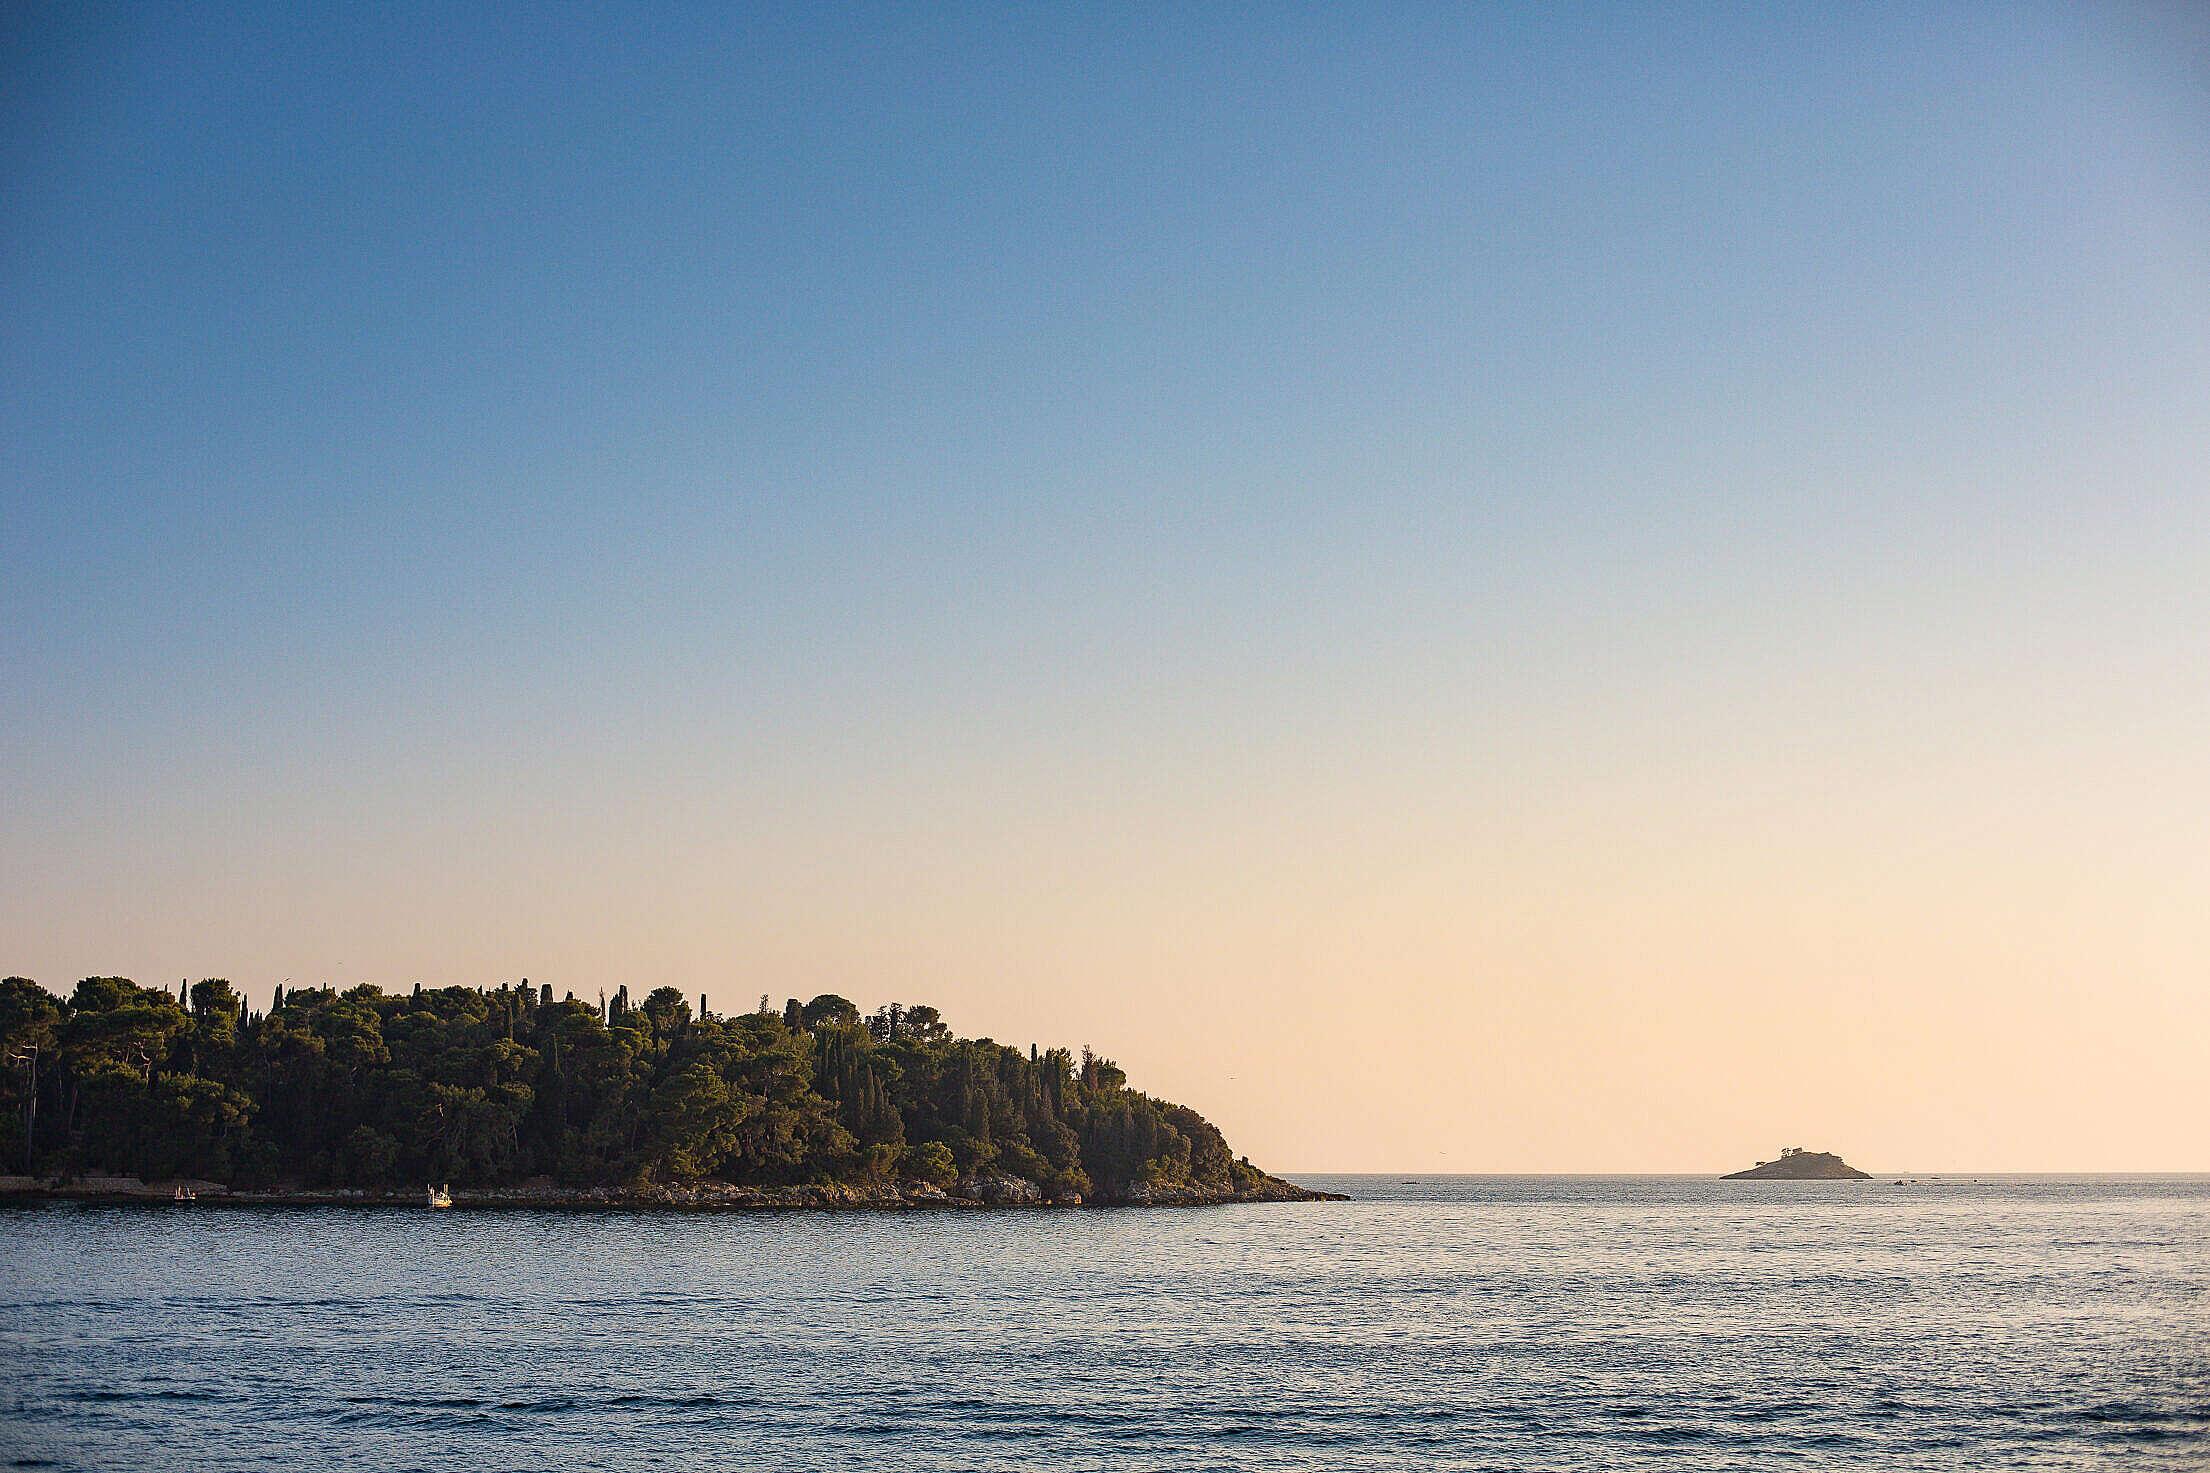 Sunset over a Small Island in Croatia Free Stock Photo